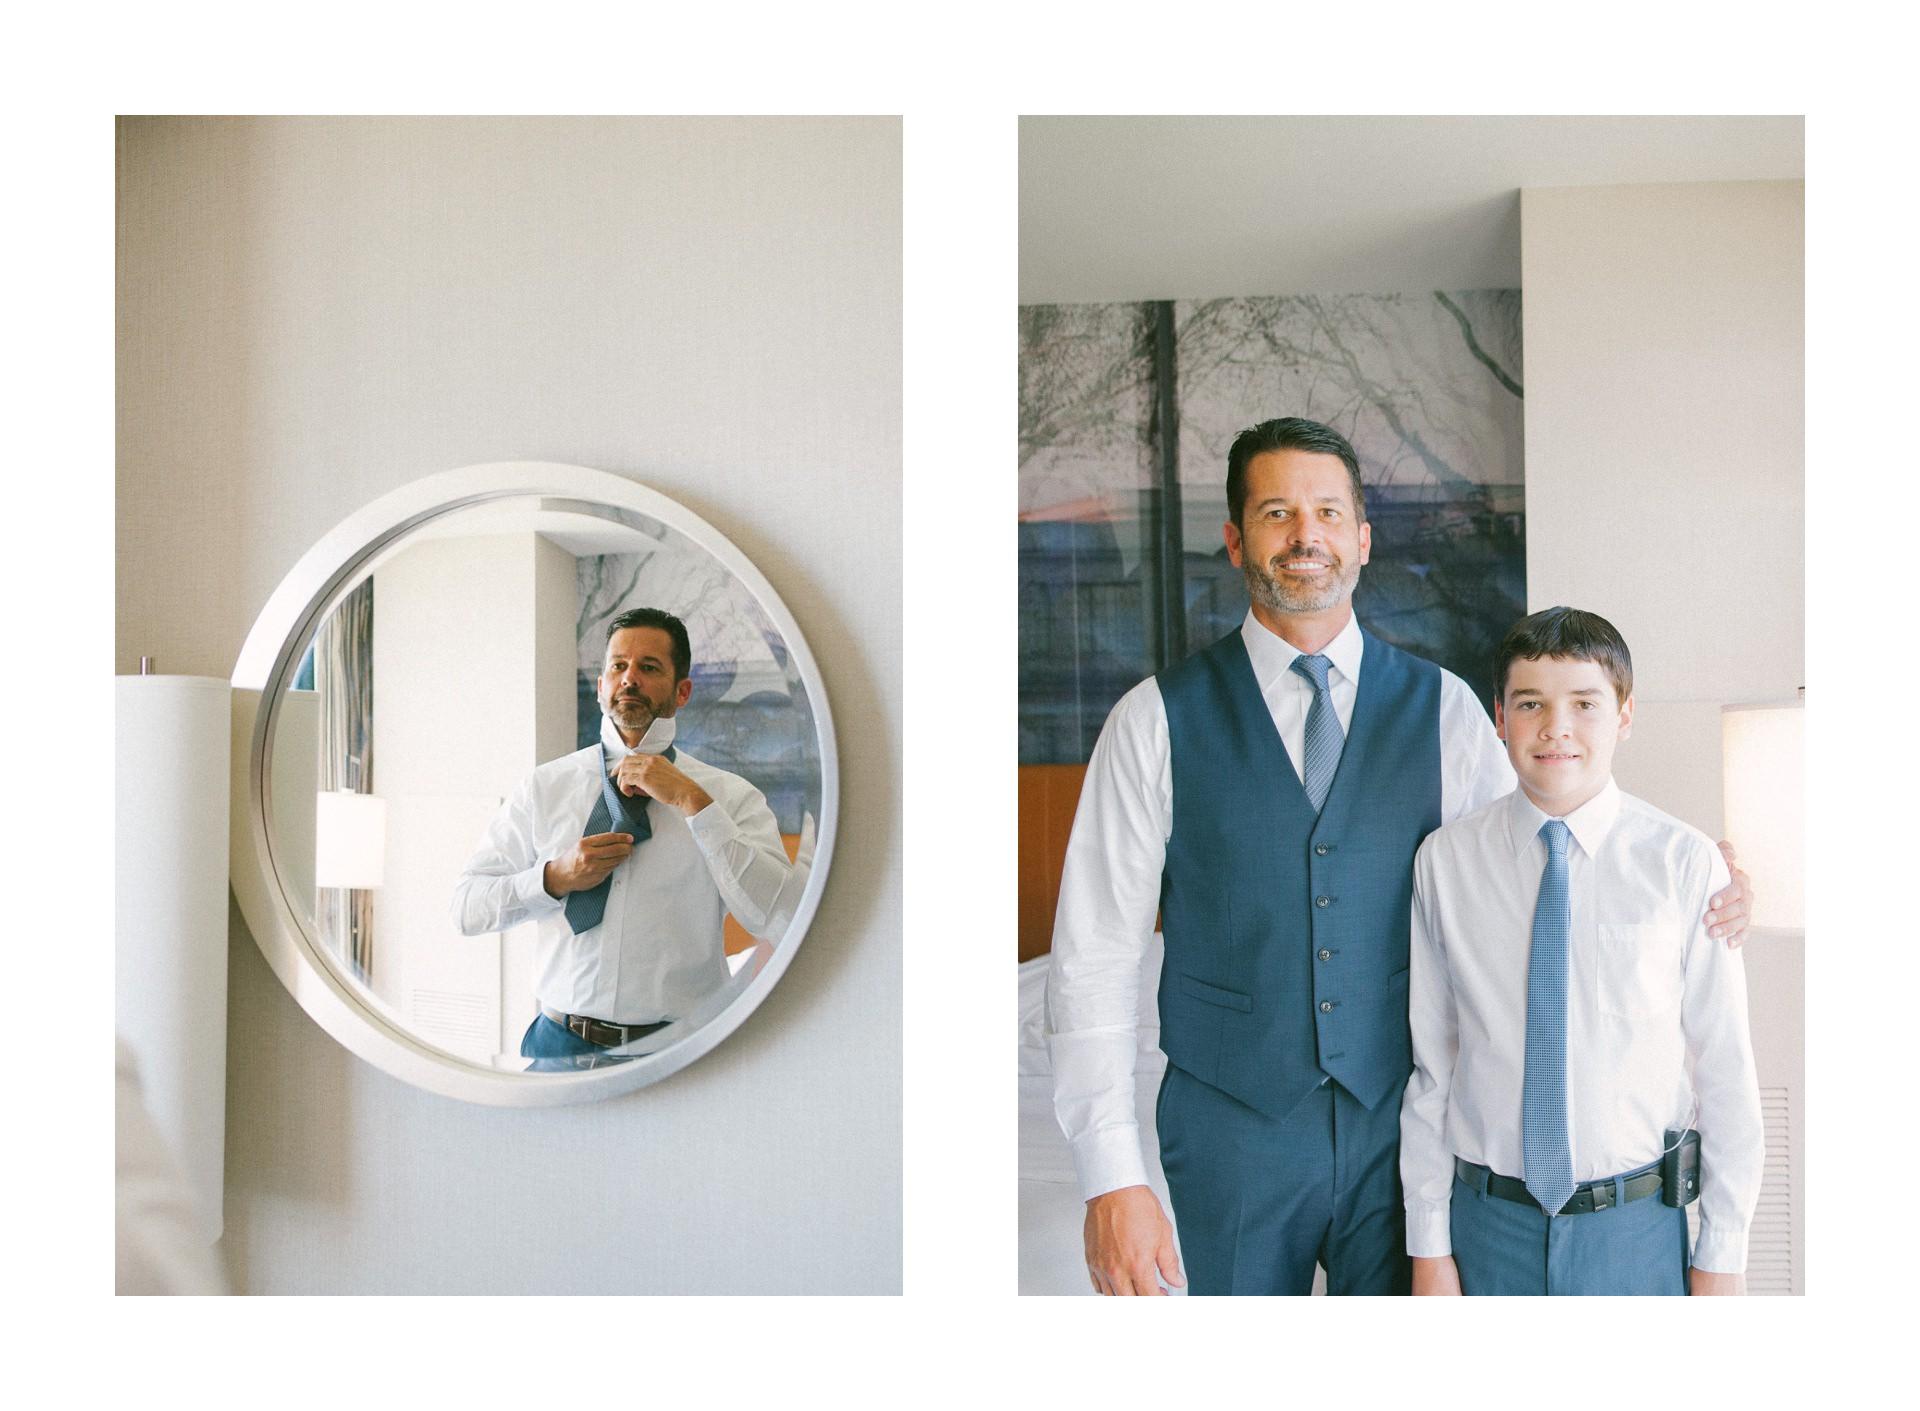 Nuevo Modern Mexican Wedding Photographer in Cleveland 1 8.jpg